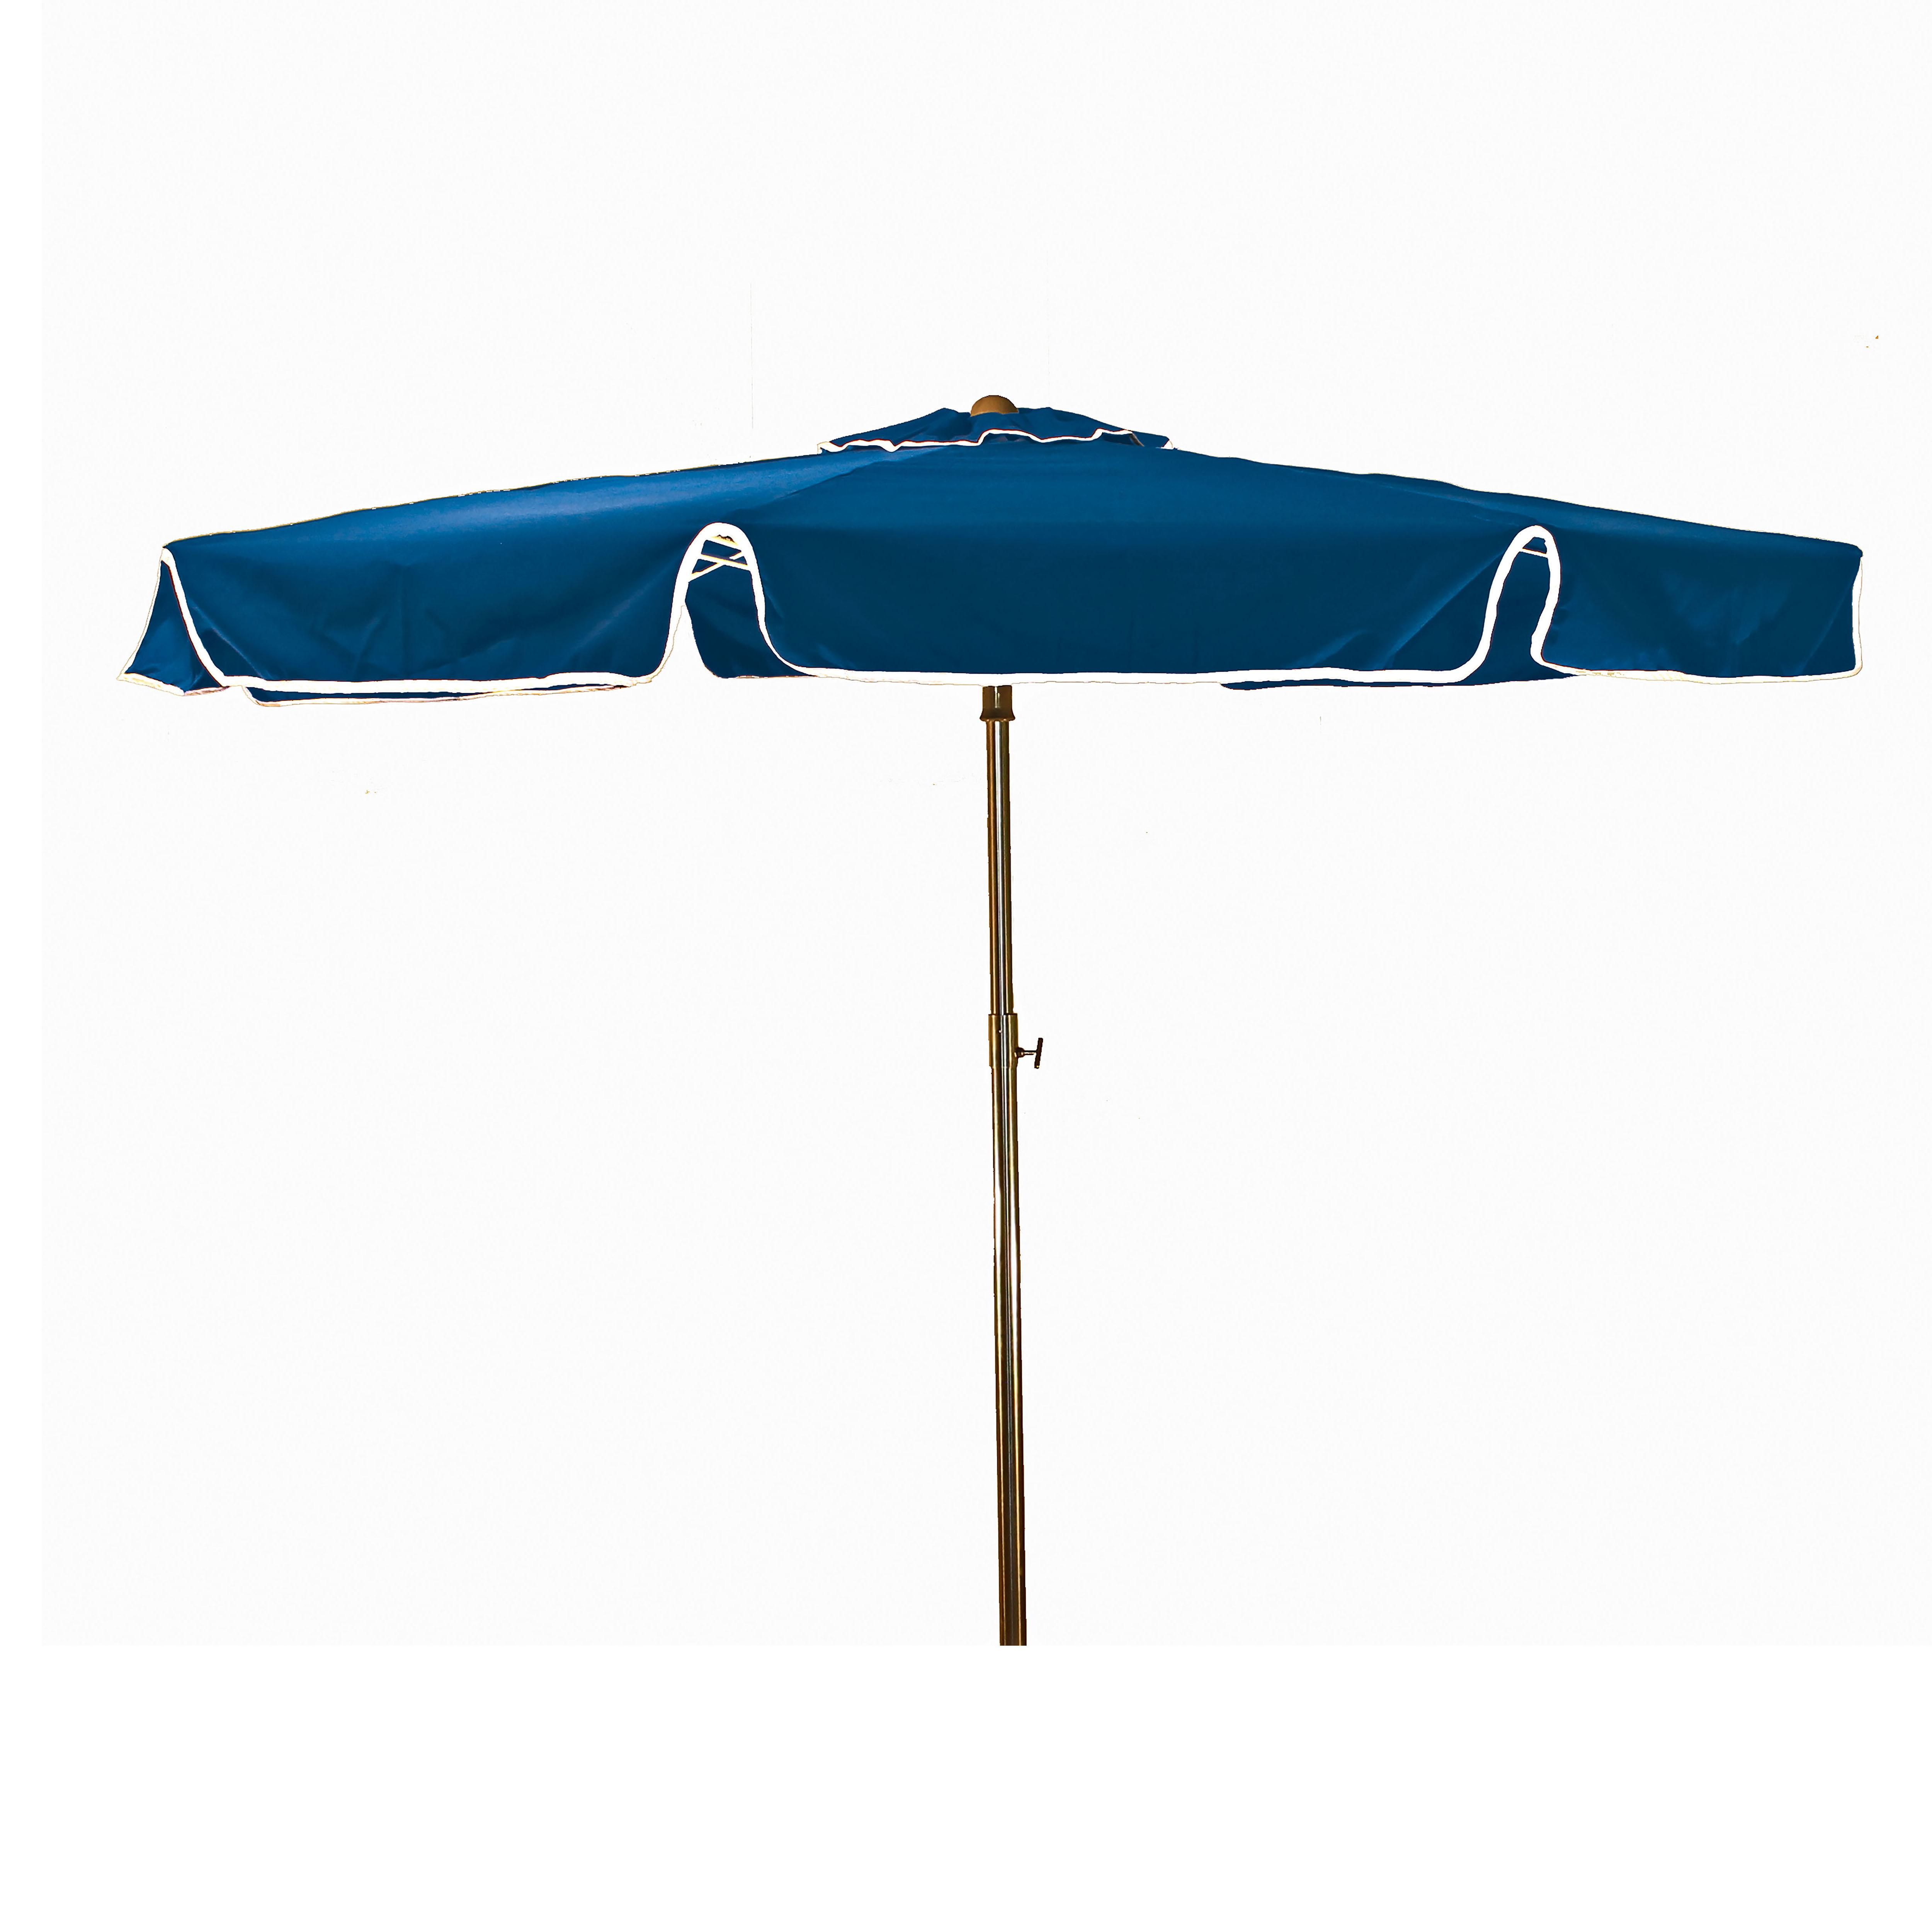 Grosfillex 98129731 umbrella